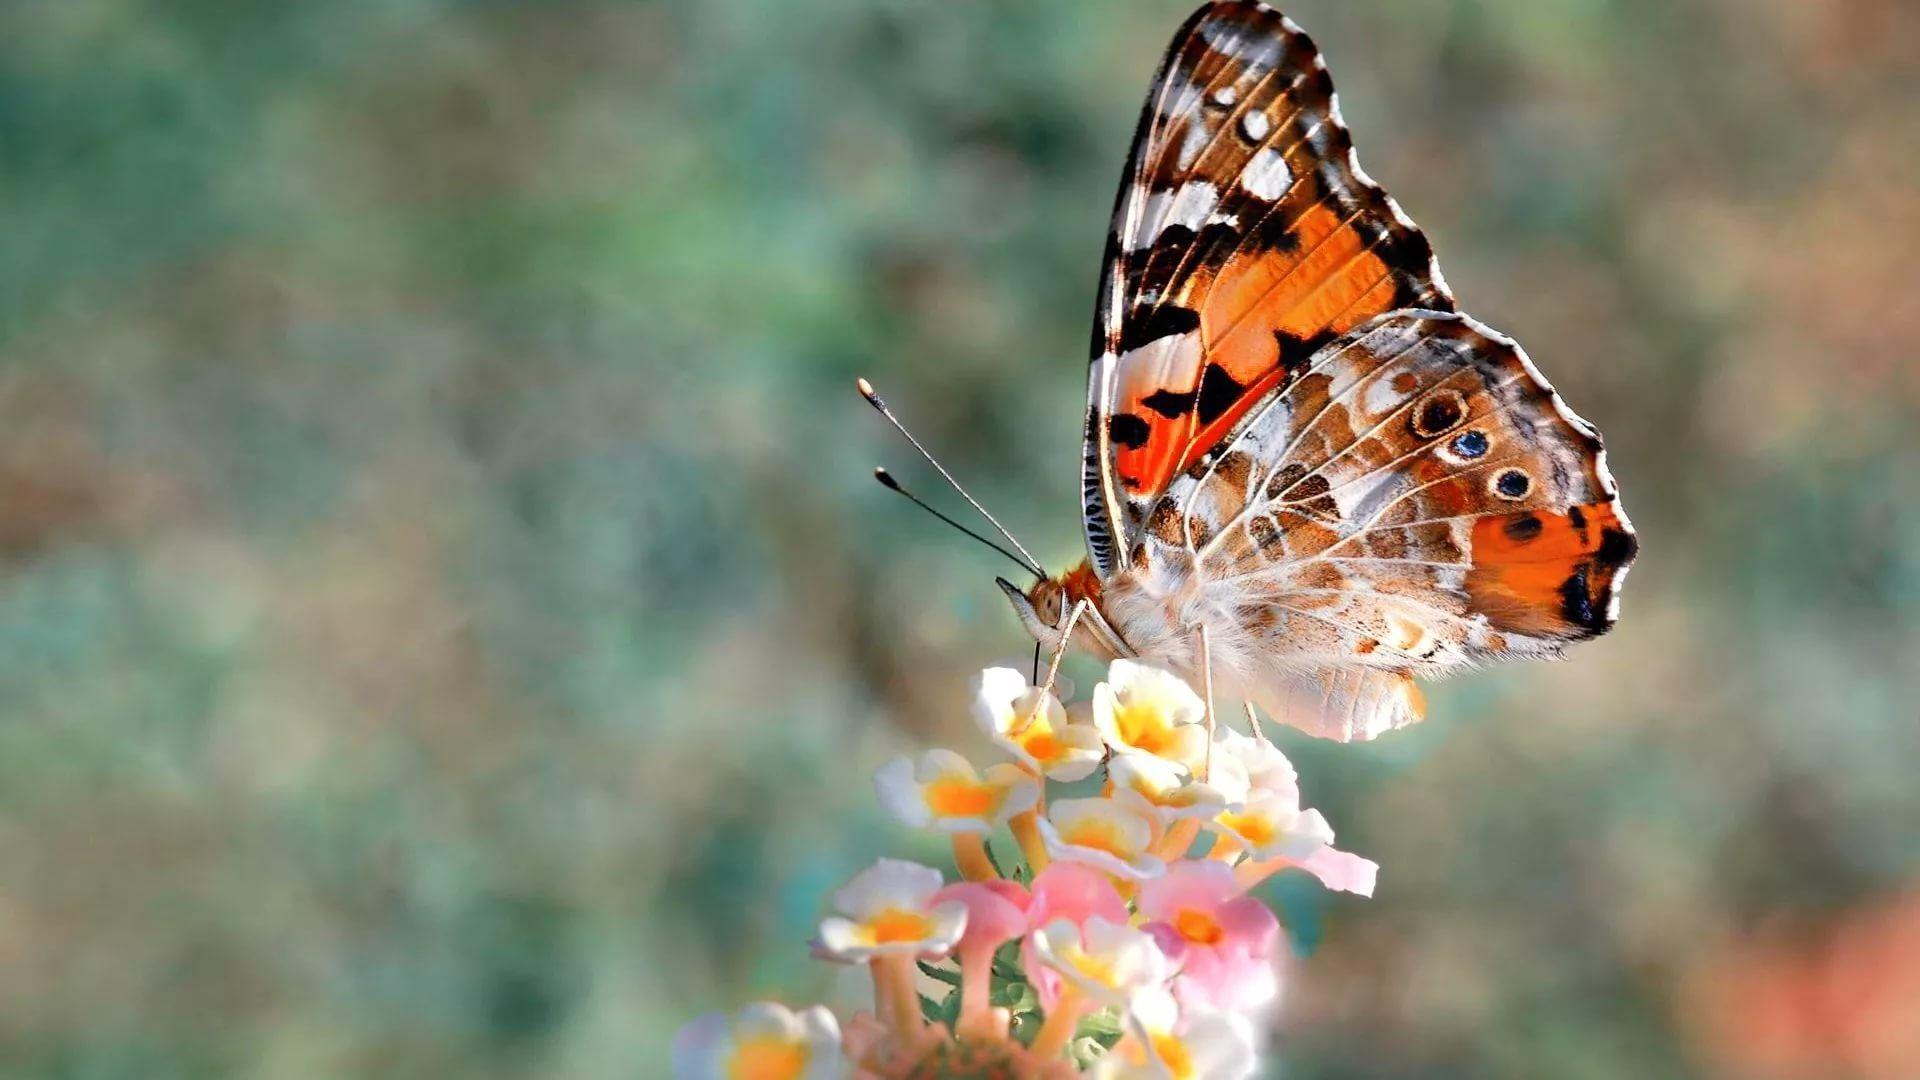 Nice Butterfly wallpaper theme